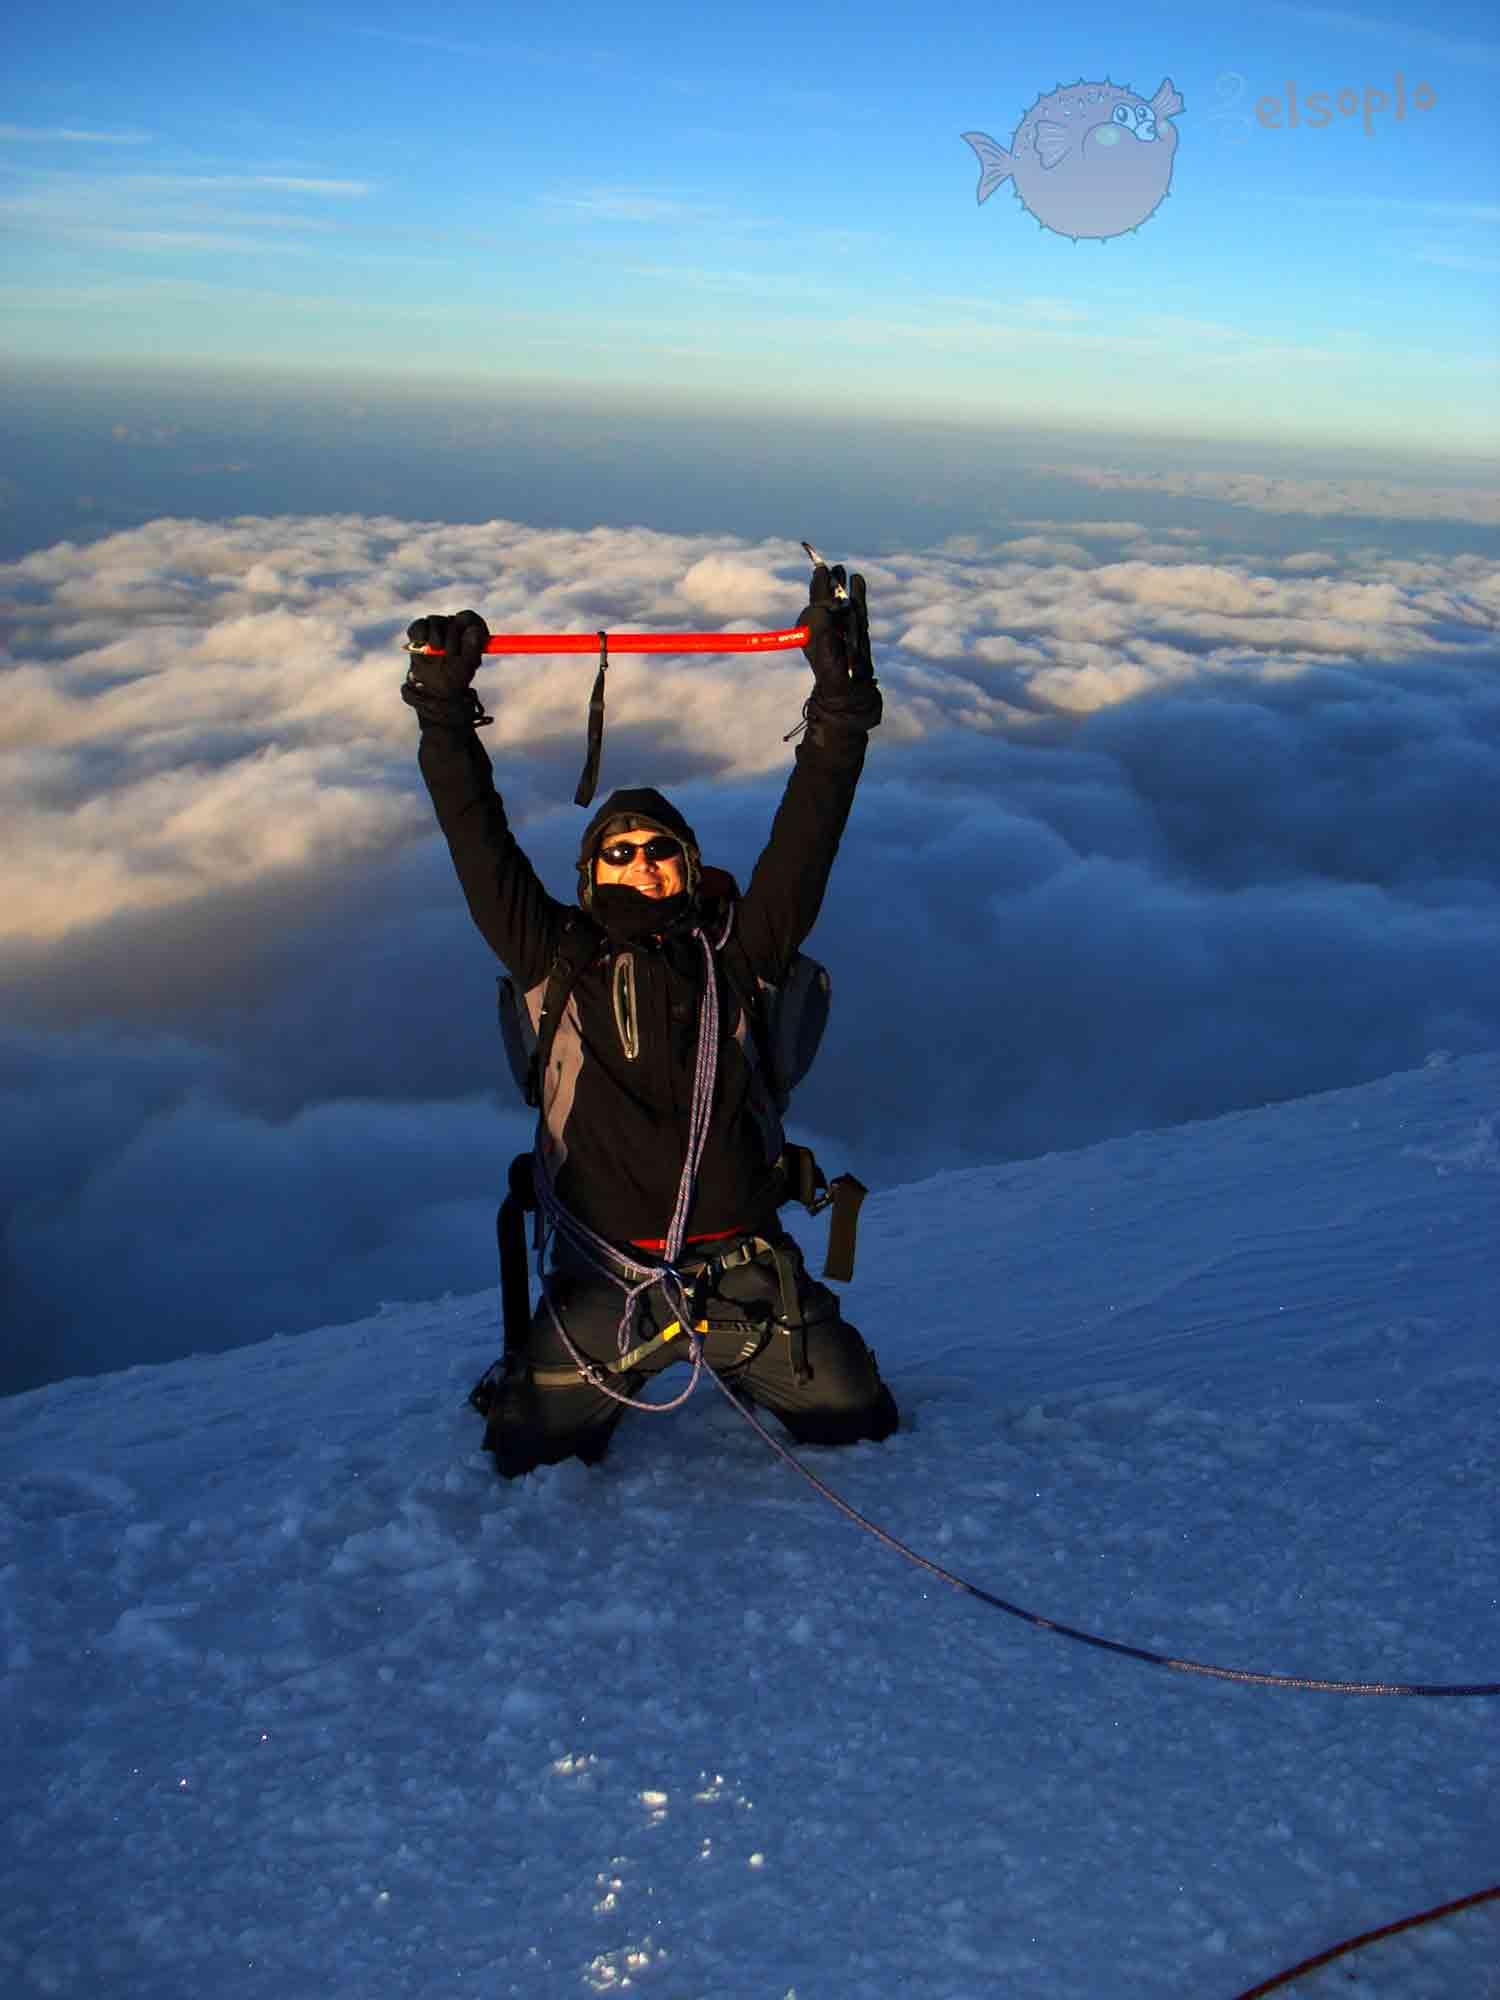 Mont Blanc (4.810 metros). Cumbre más alta de Europa